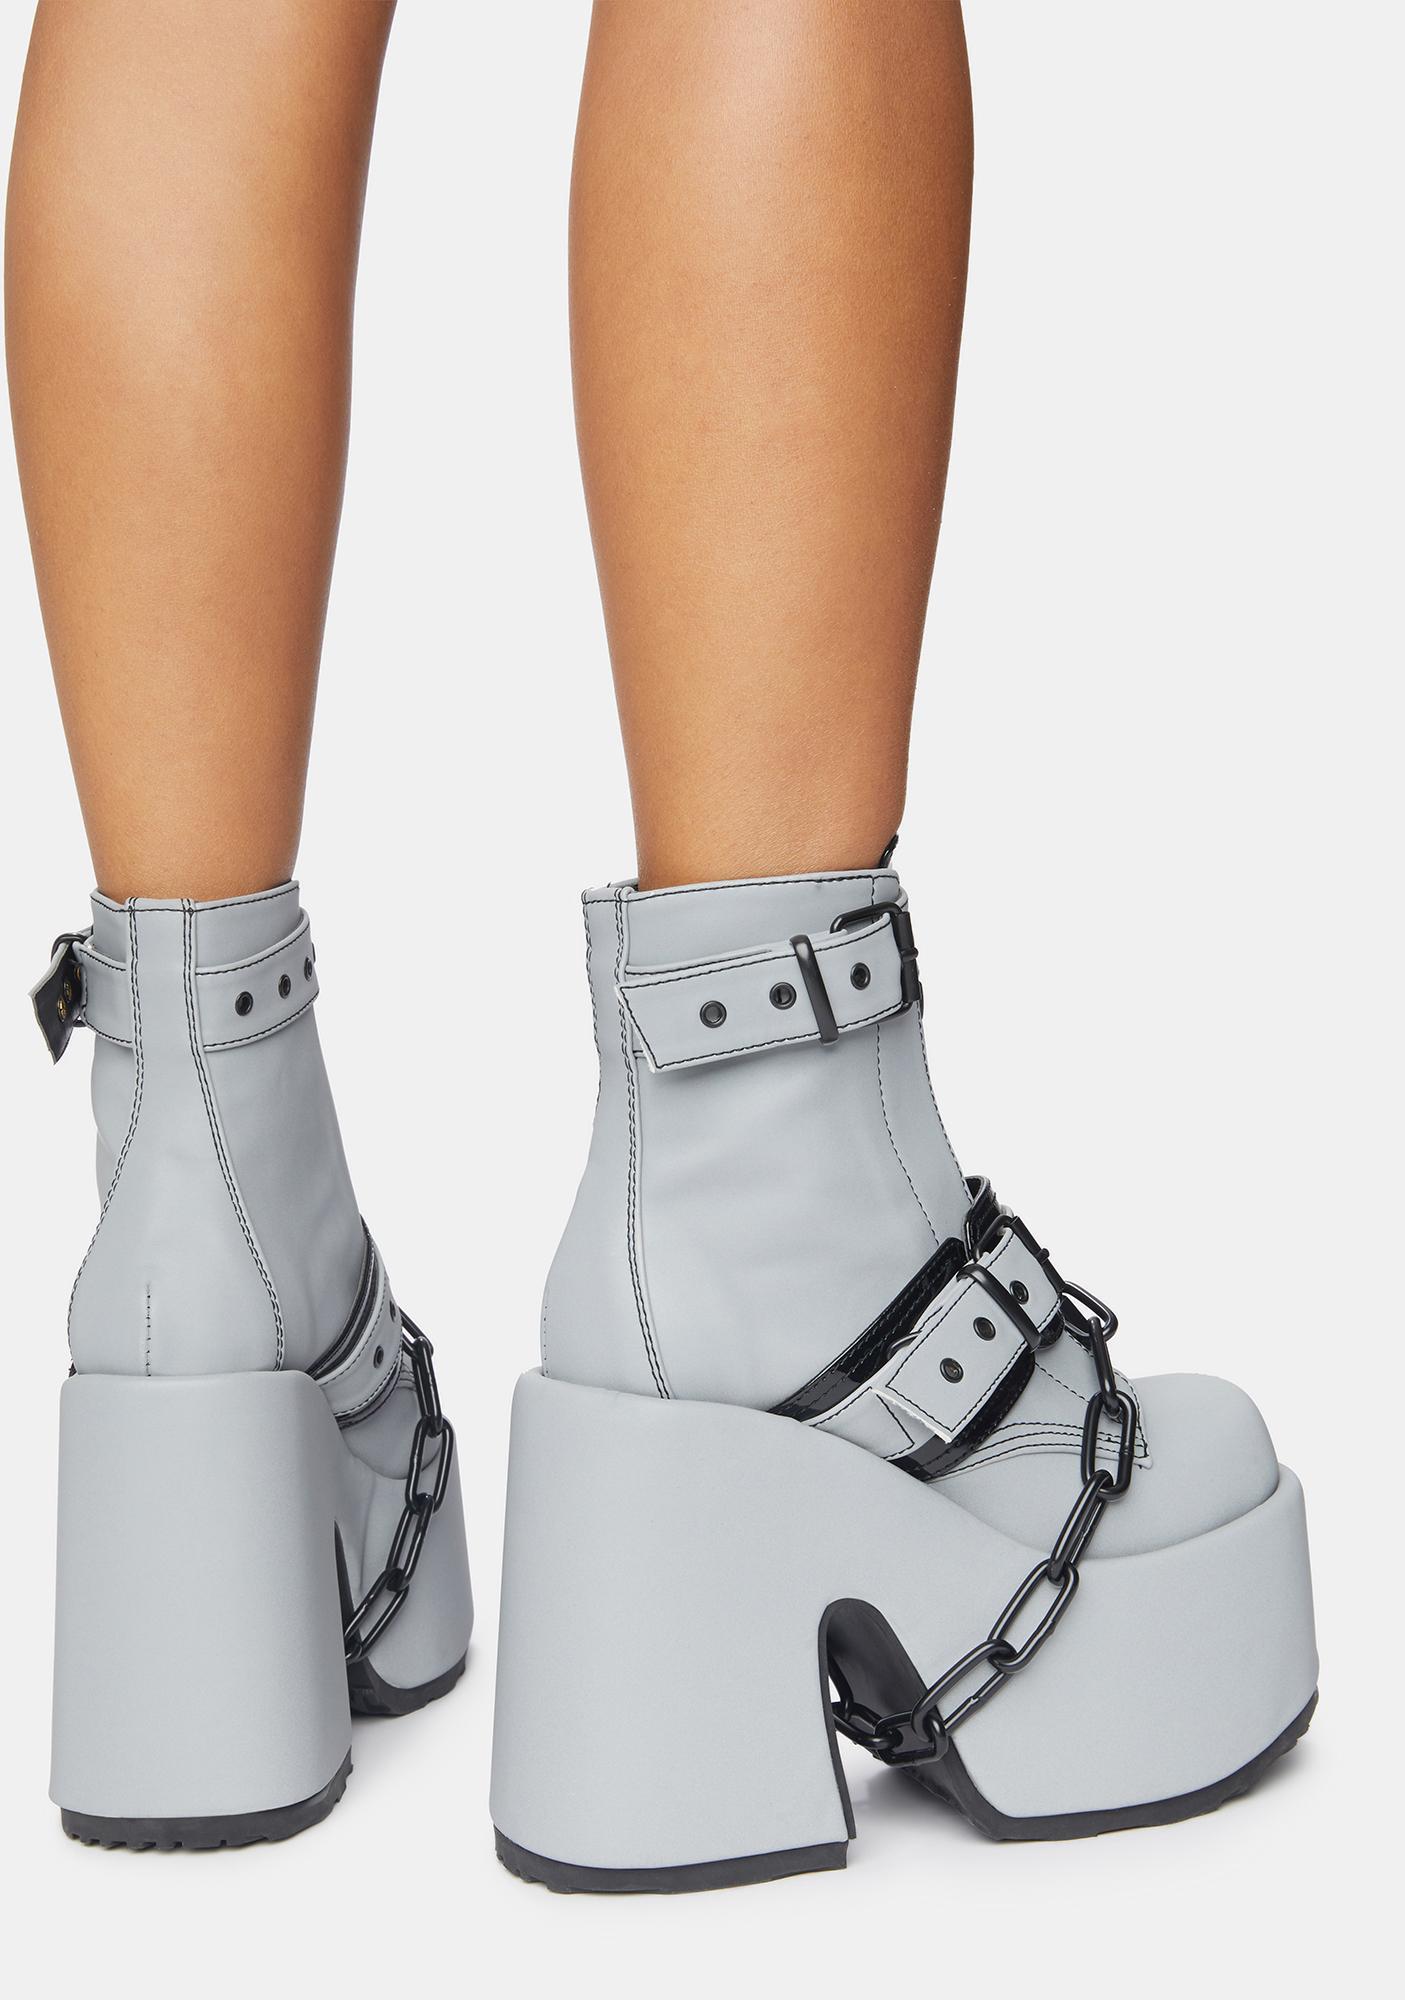 Demonia Glow In The Dark Ruin My Life Platform Ankle Boots